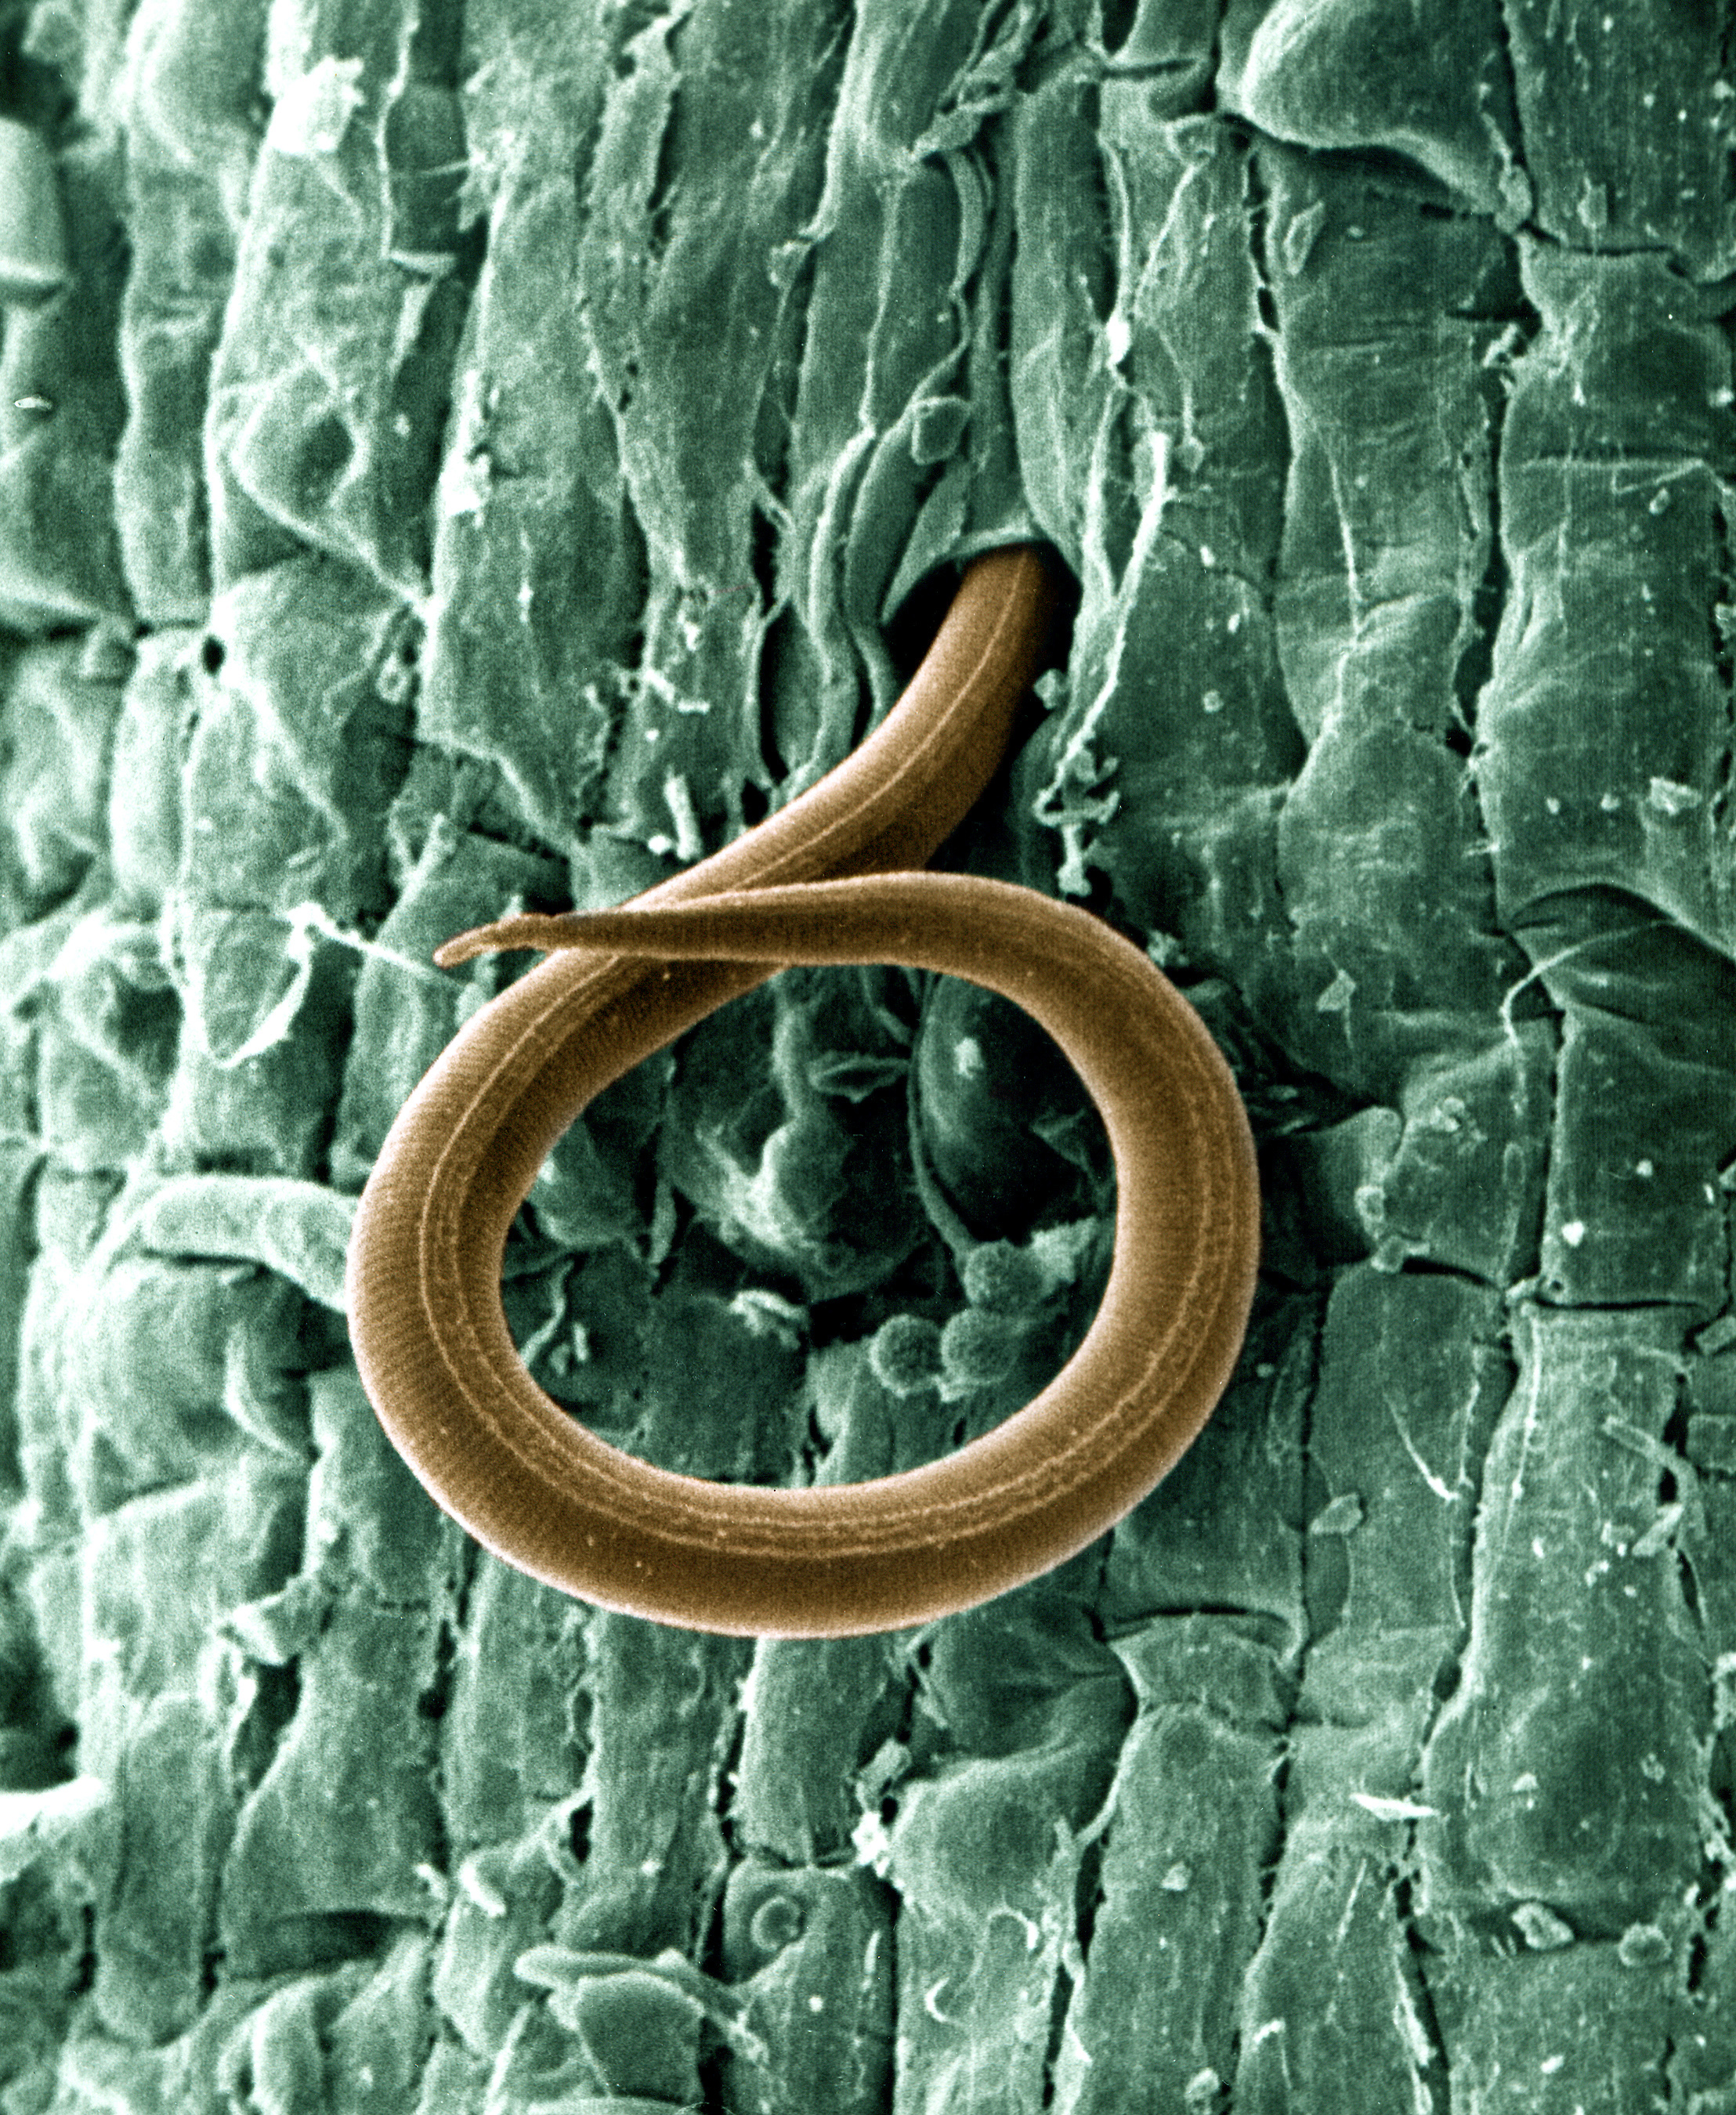 An essay on plant pathogenic nematodes